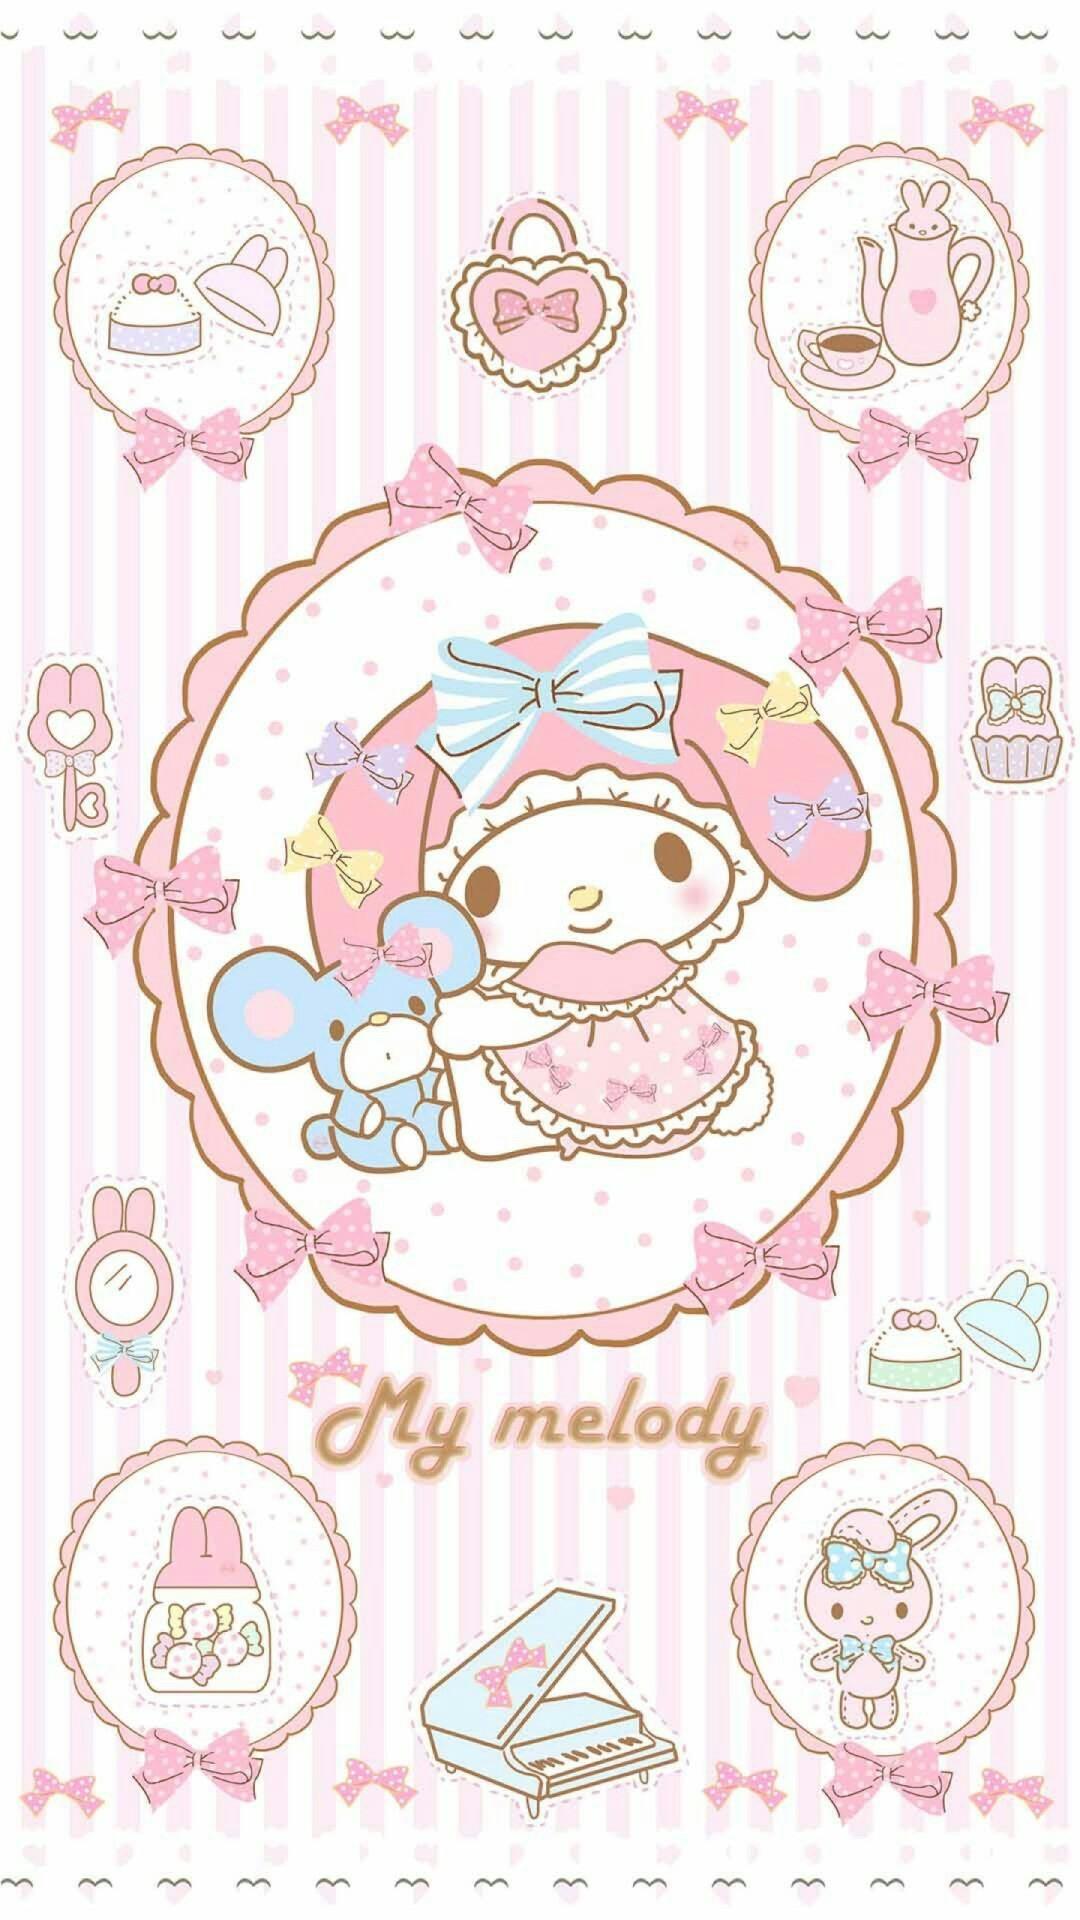 Sanrio Characters Wallpaper (68+ images)